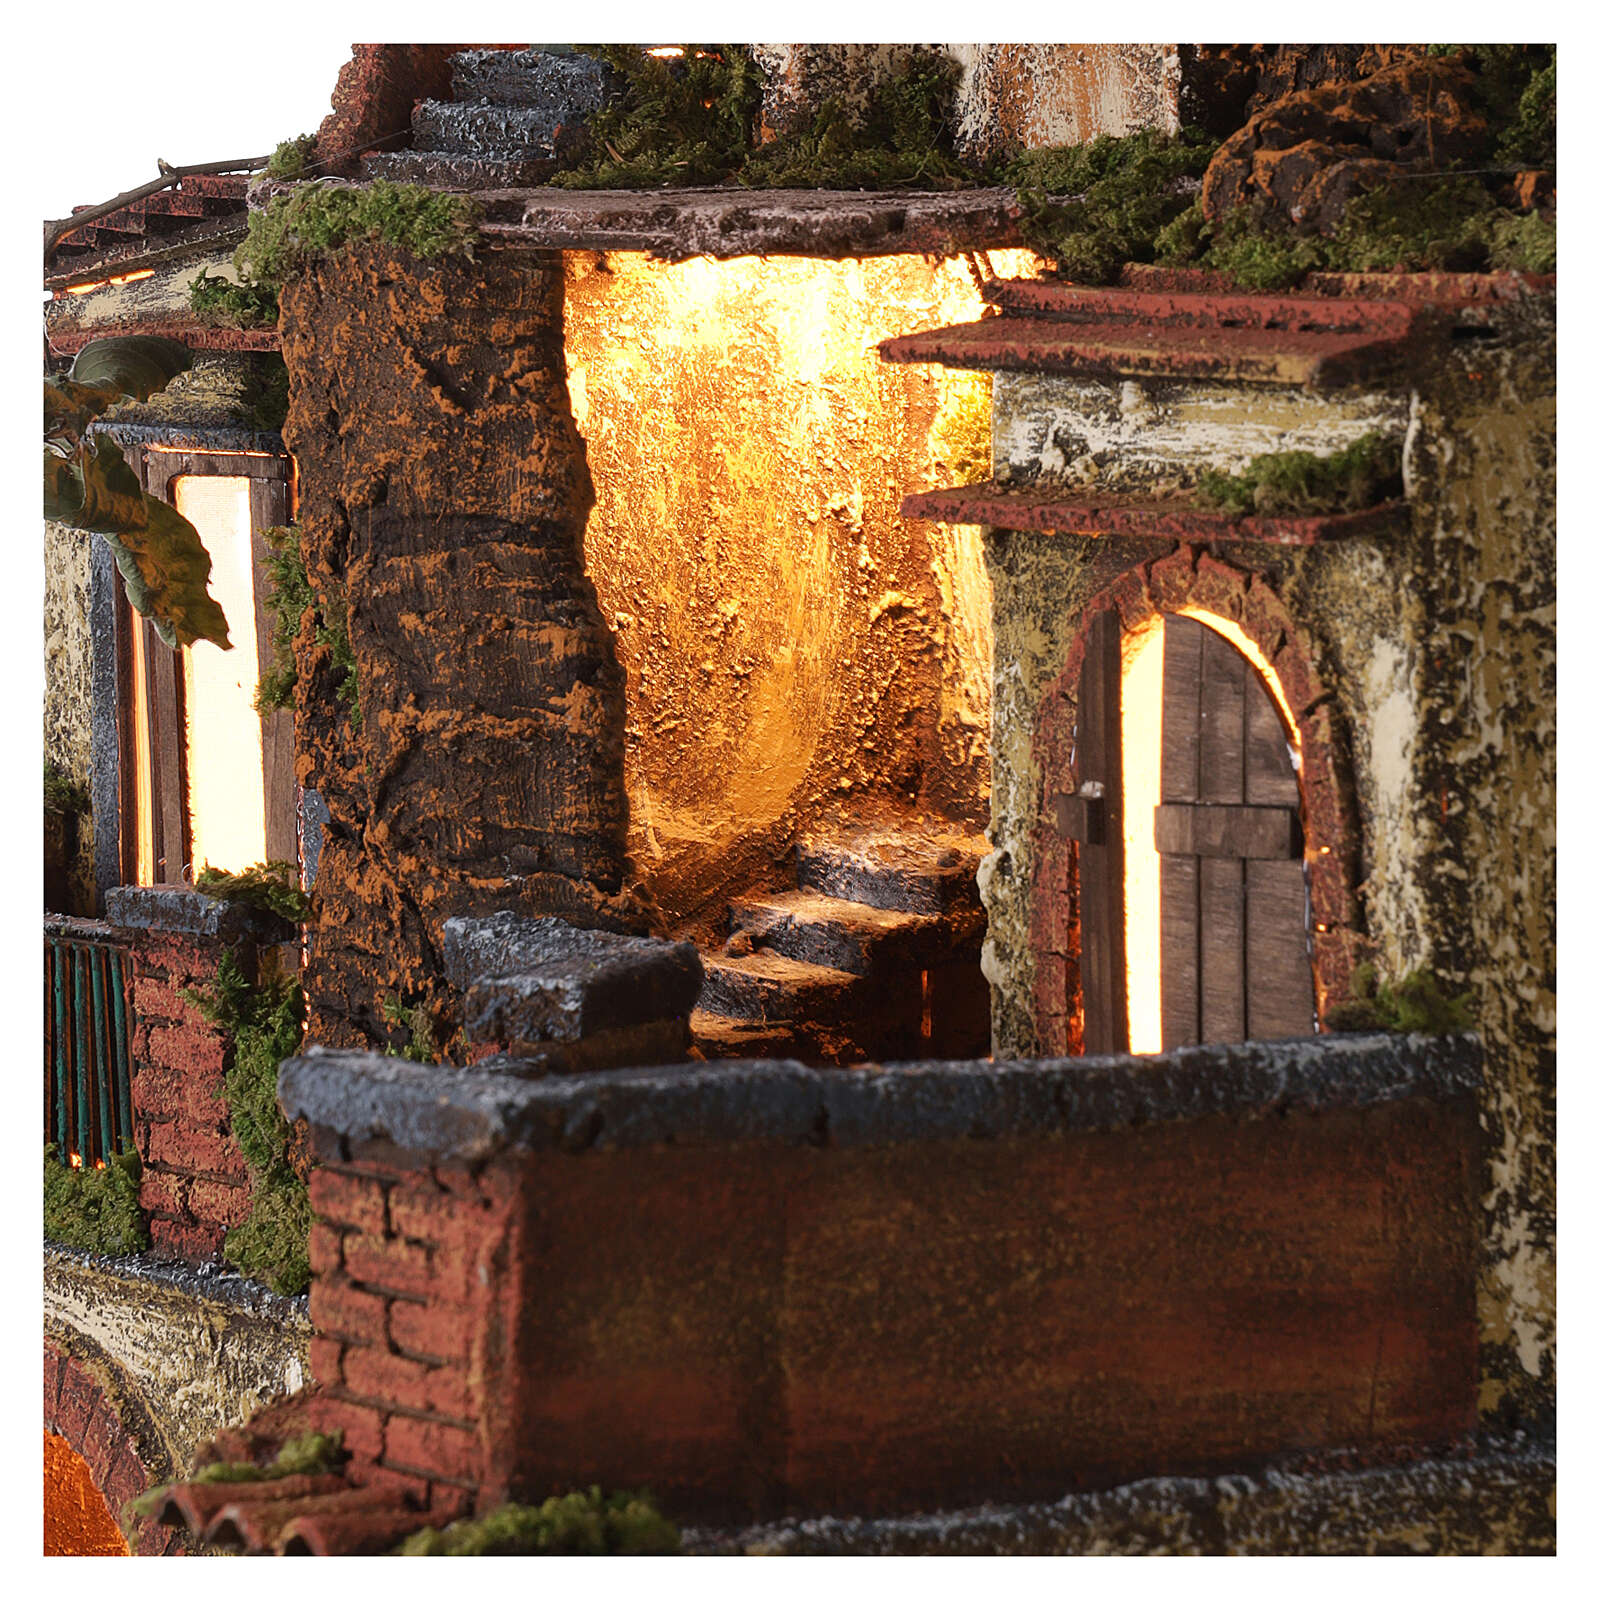 Borgo presepe napoletano stile 700 con luce 45x49x37 4